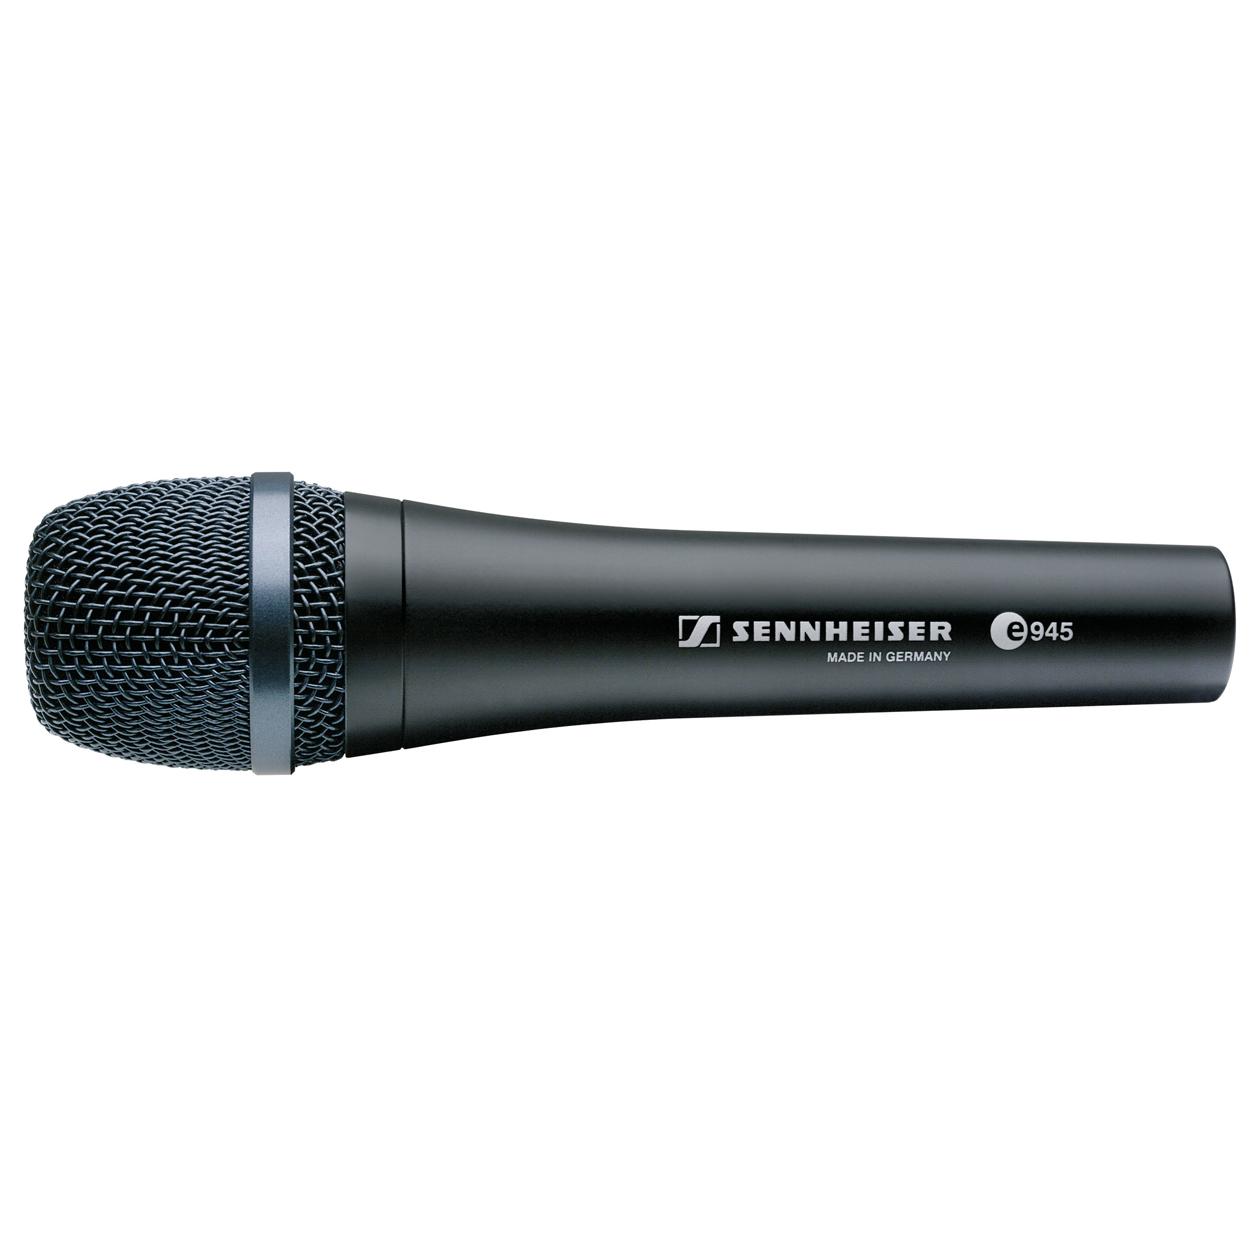 Afbeelding van Sennheiser E 945 zangmicrofoon dynamisch met supernier karakteristiek